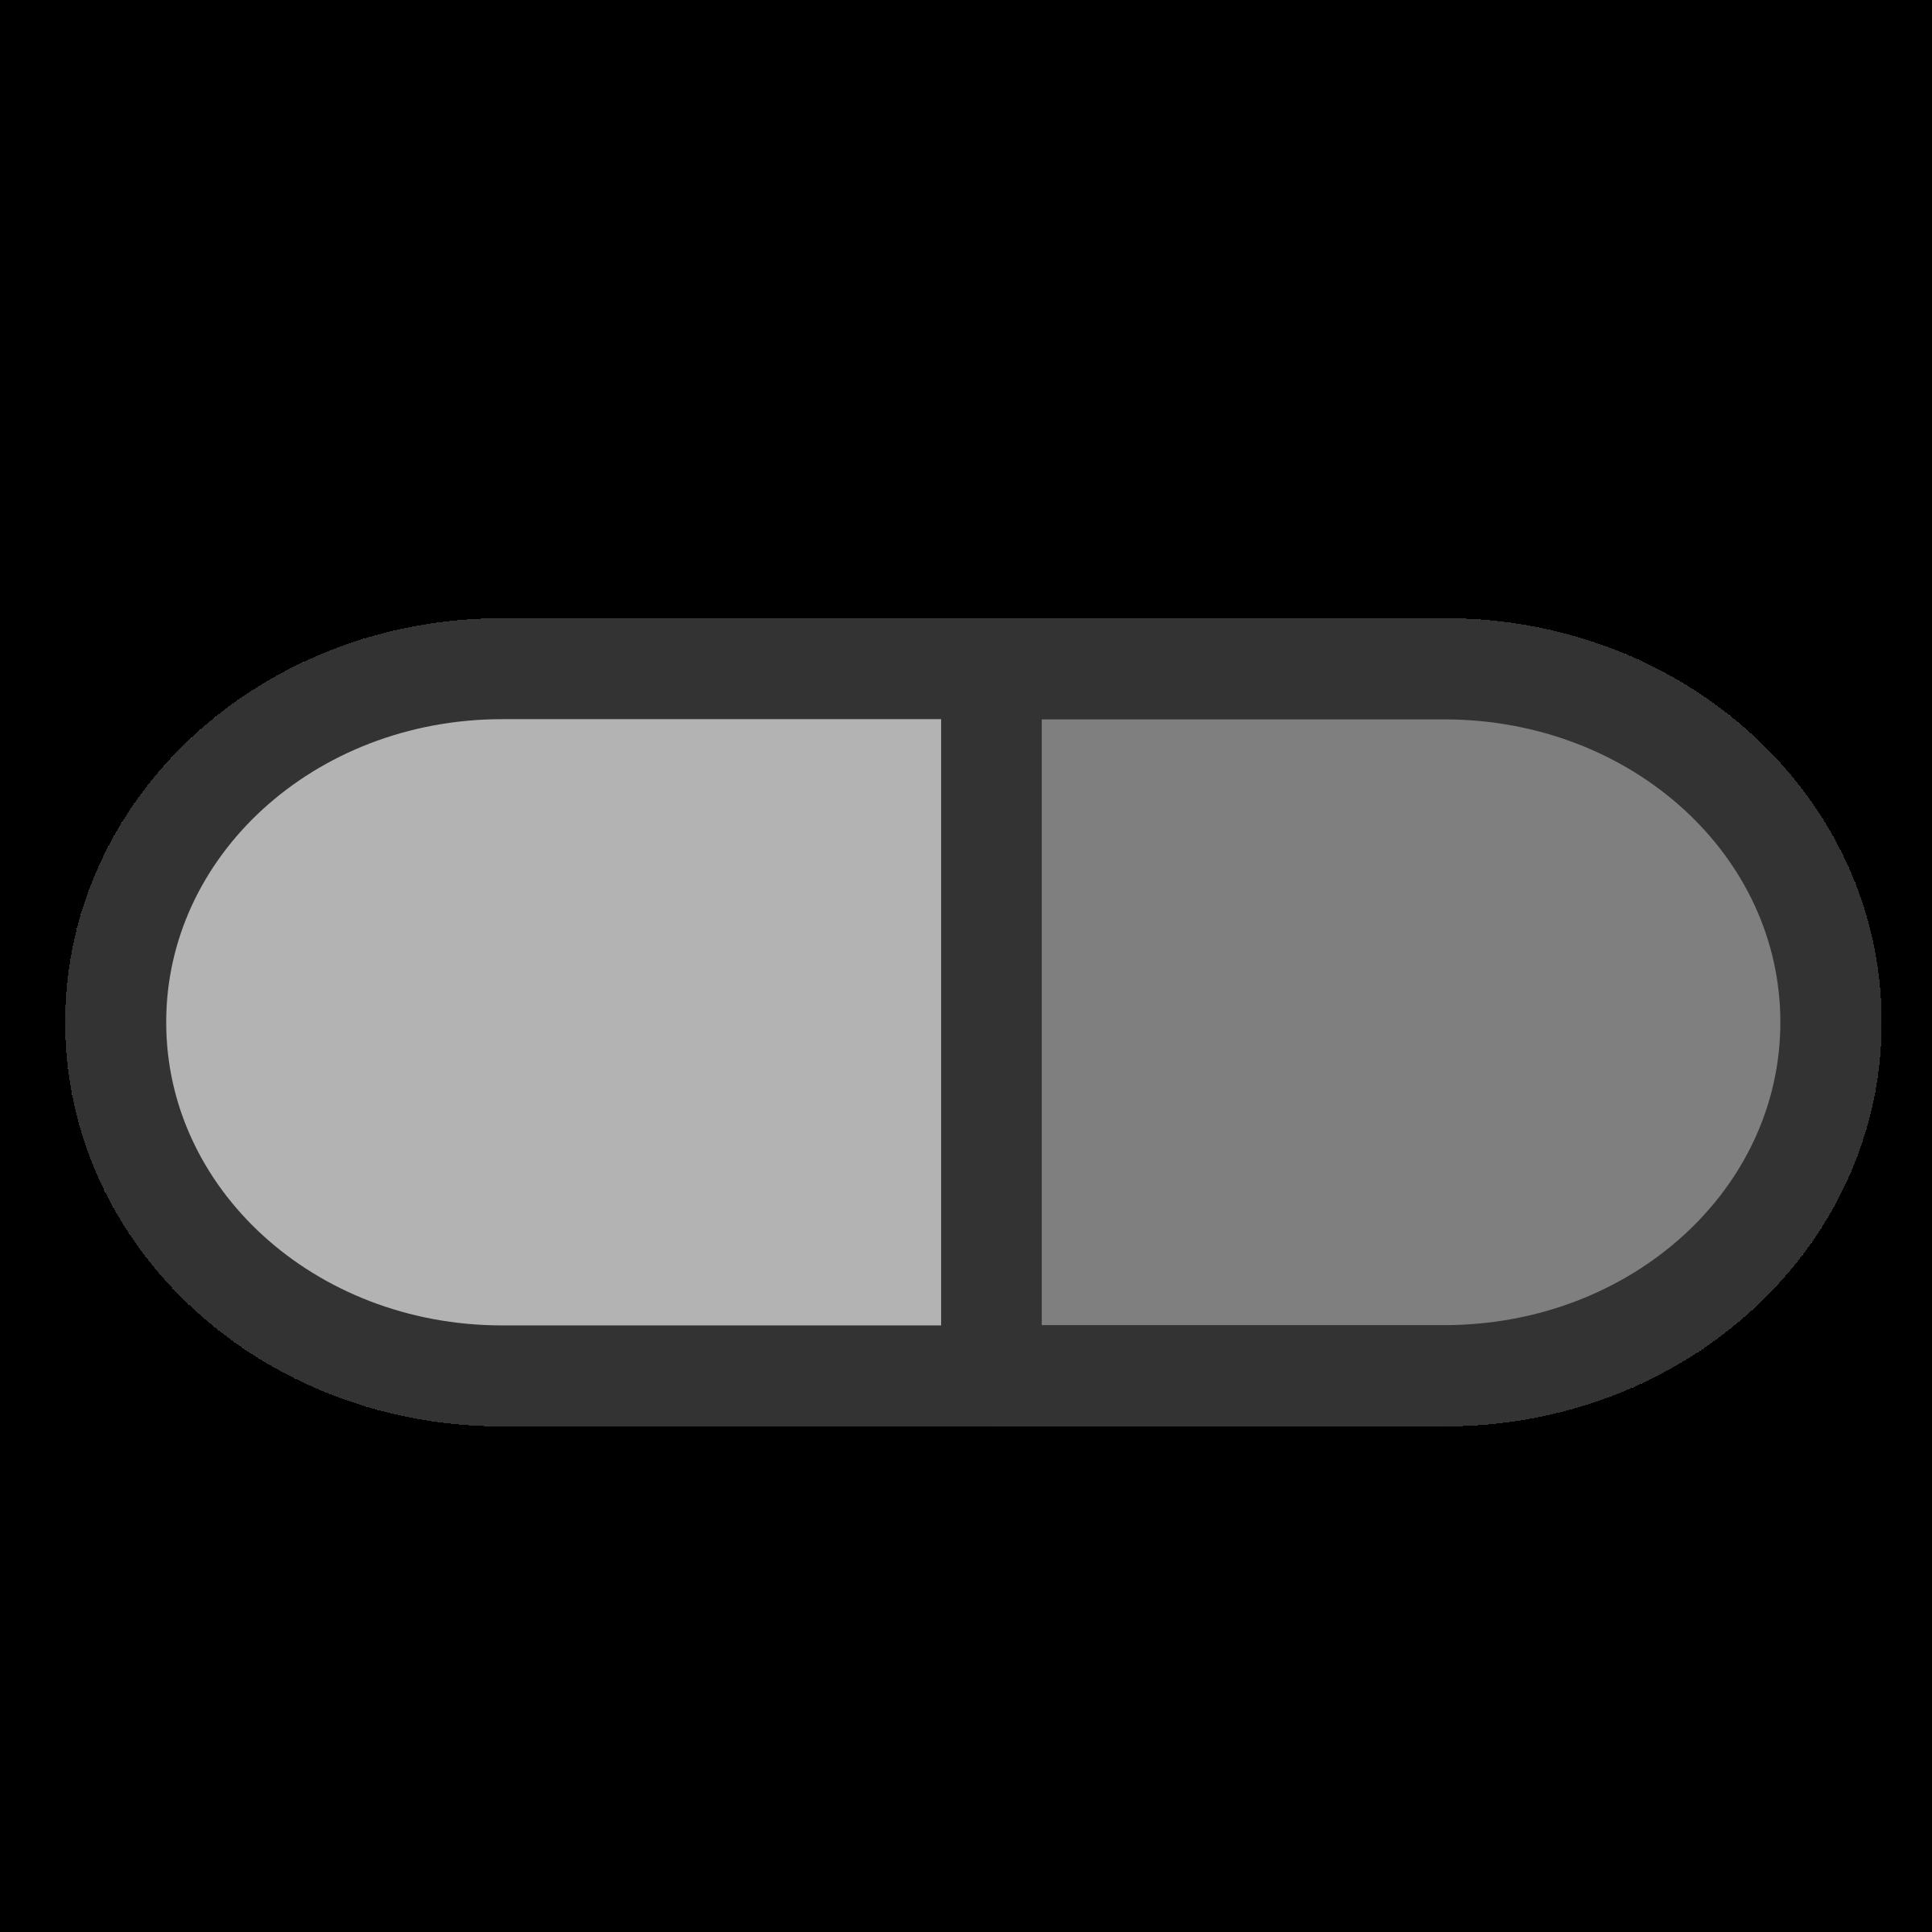 Pills clipart transparent Pill ftdopewars ftdopewars pill Clipart